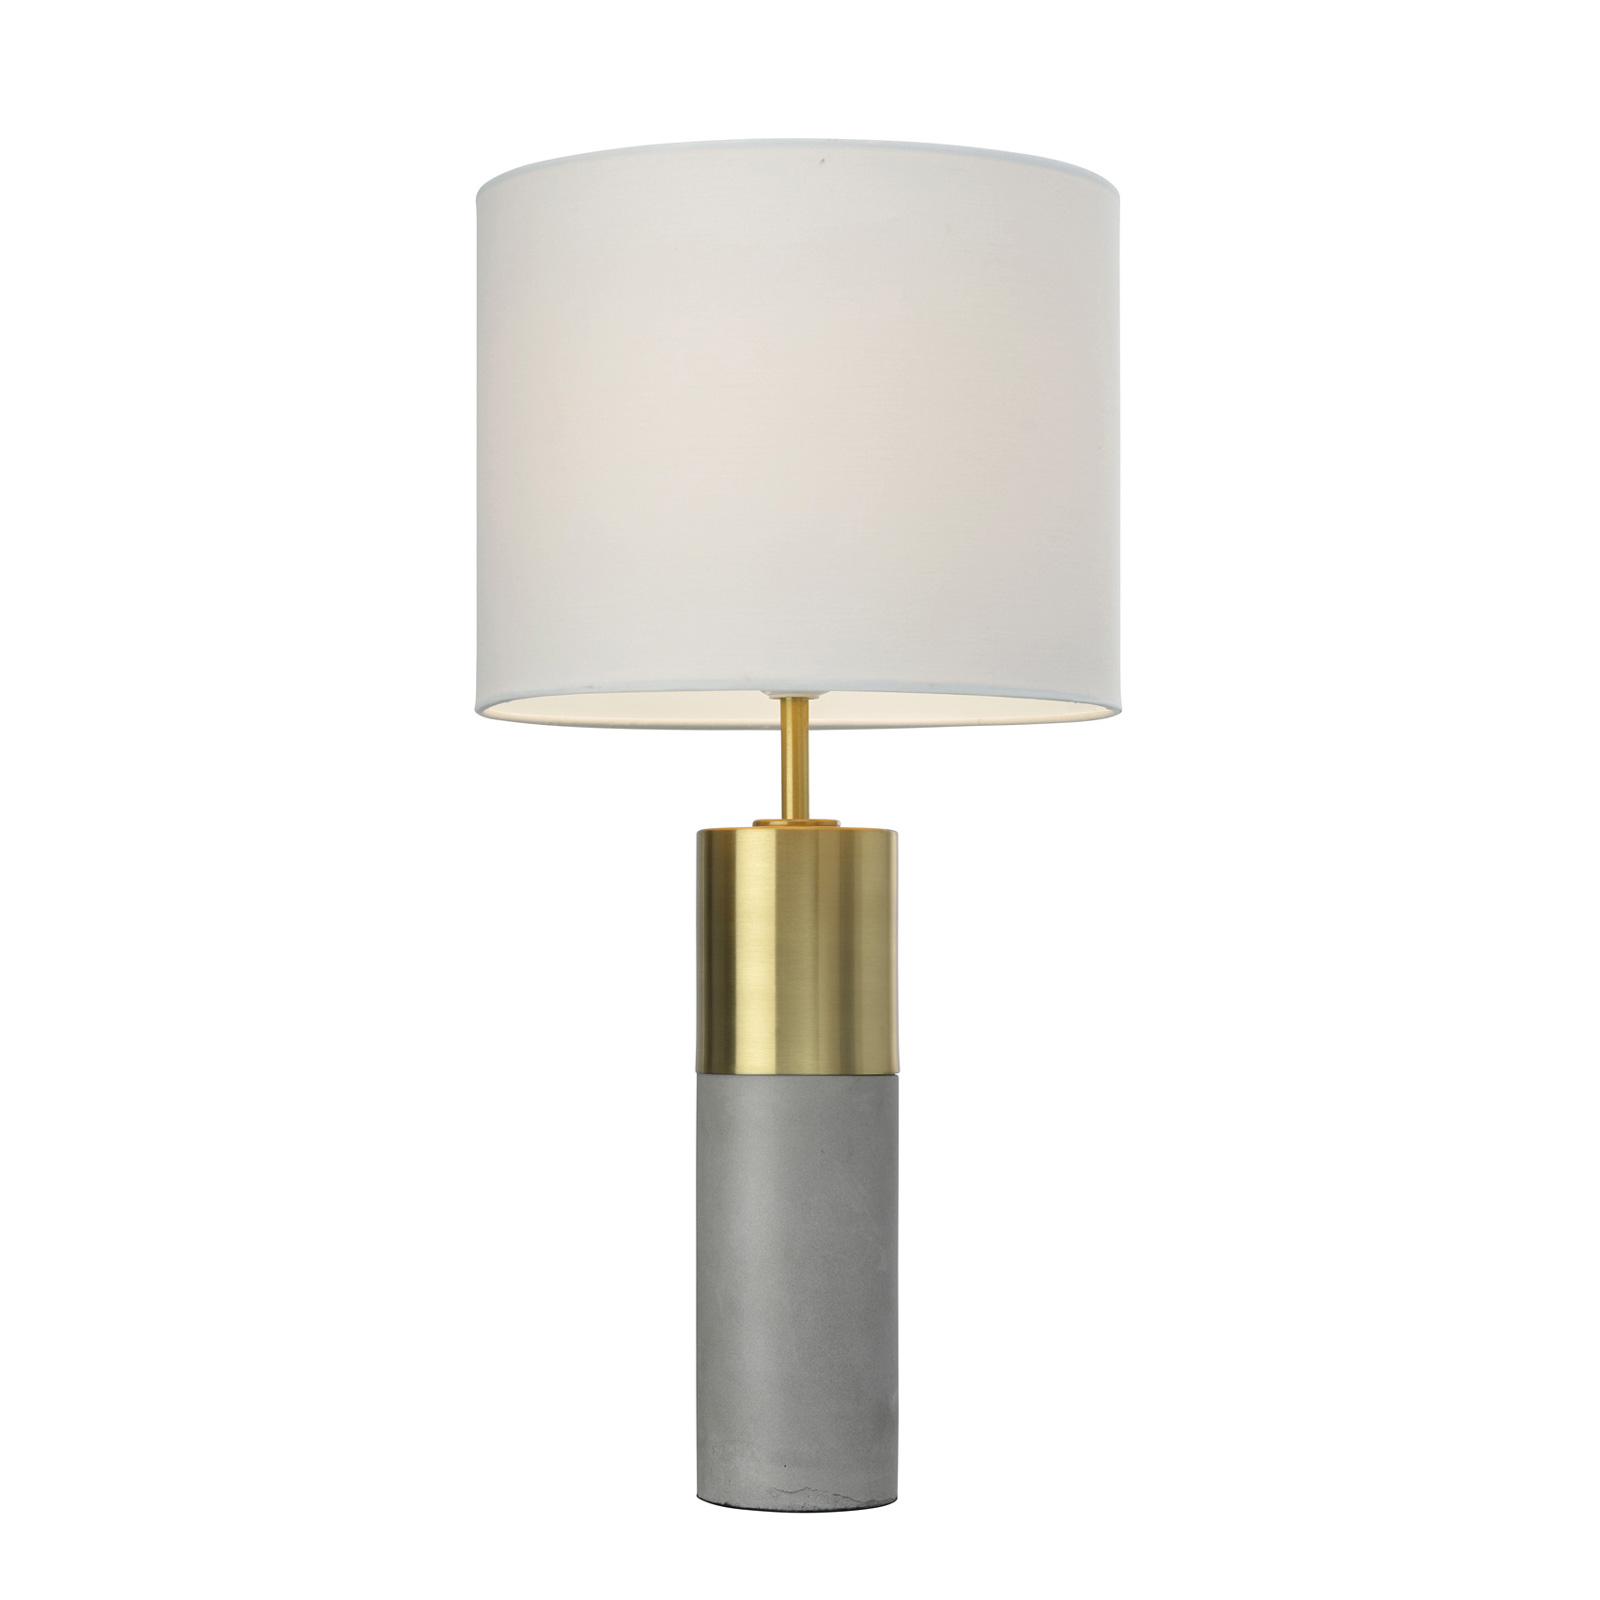 Villeroy & Boch Turin bordslampa betongoptik 25 cm